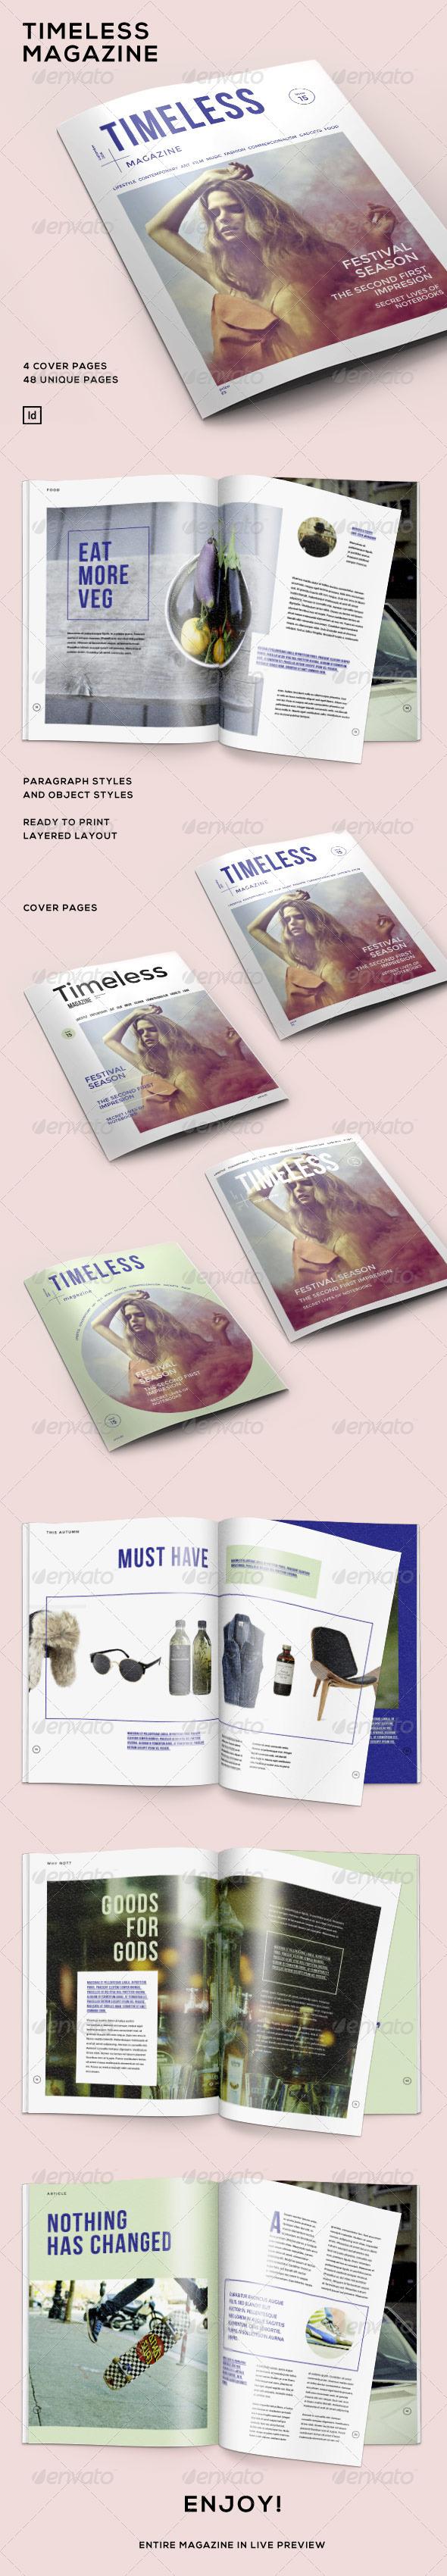 GraphicRiver Timeless Magazine 6942386